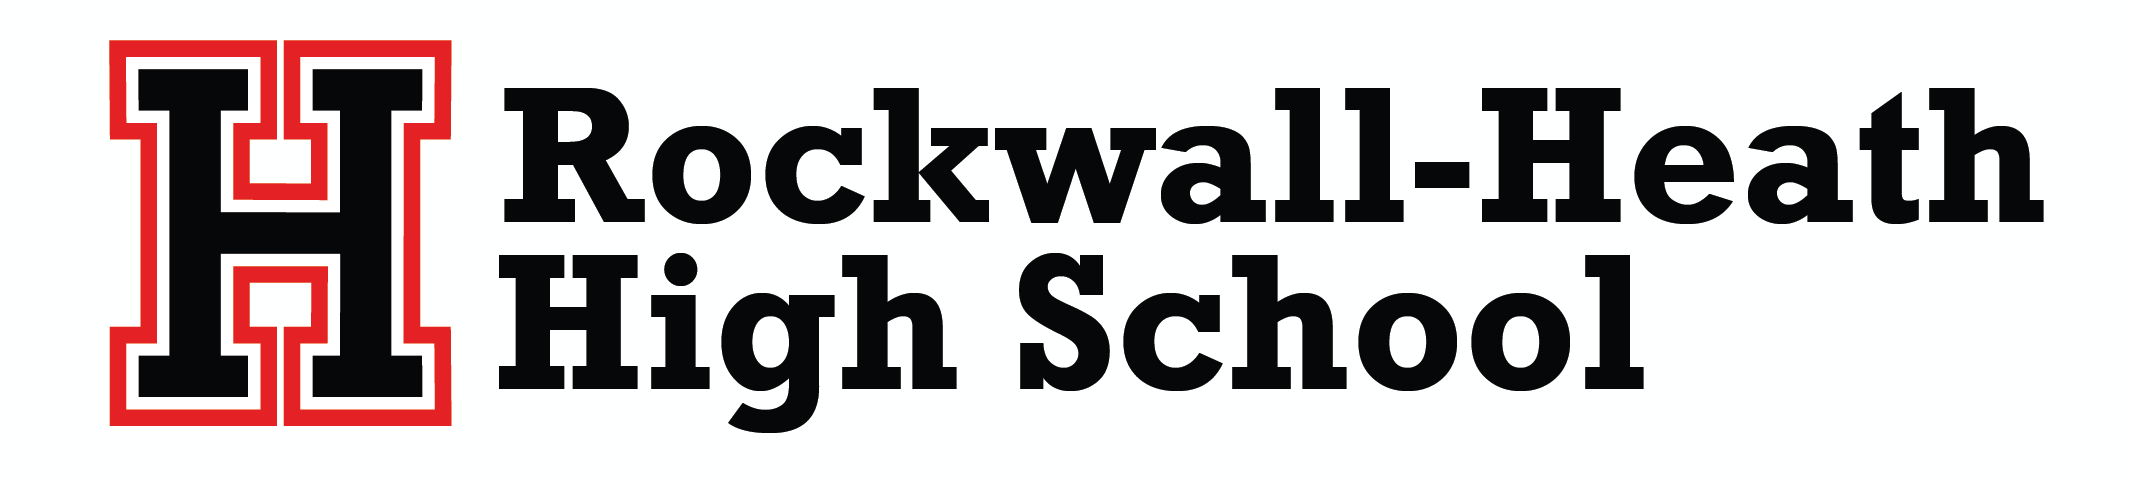 Rockwall-Heath High School